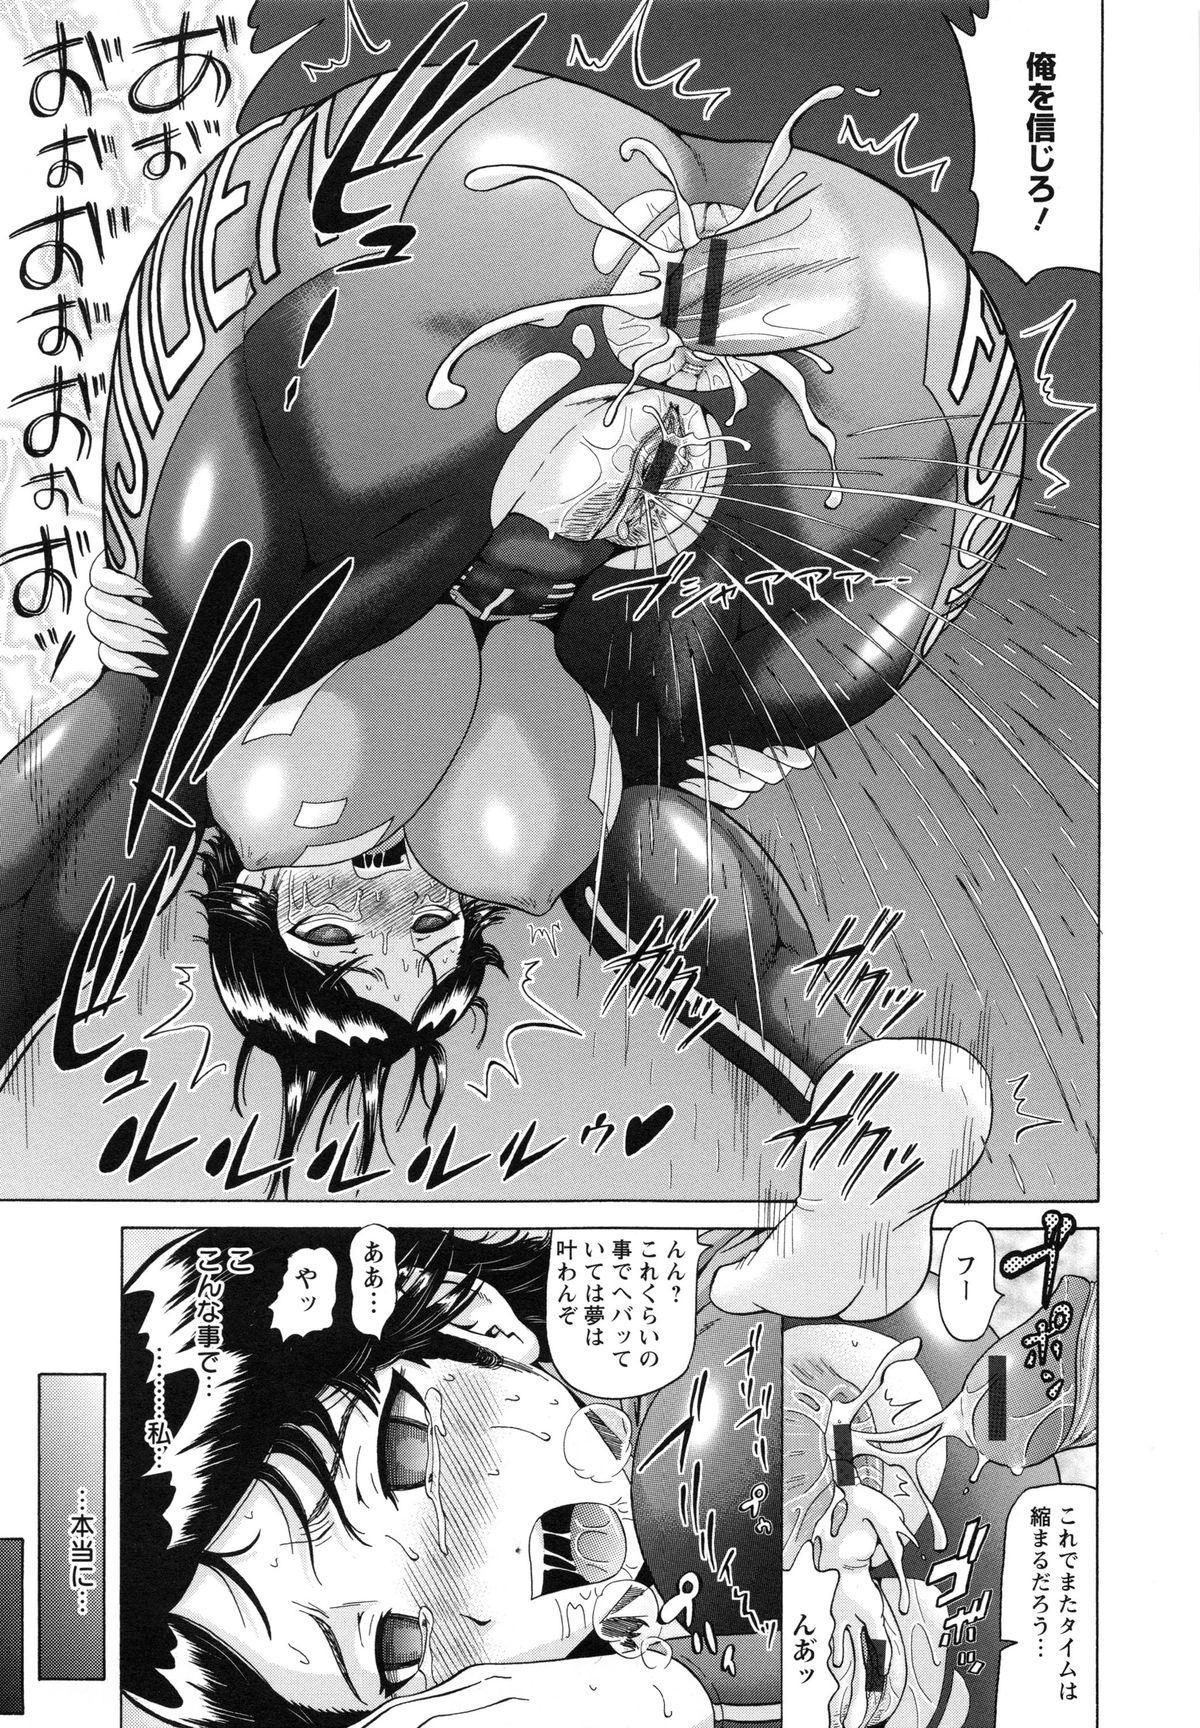 [Nukunuku Orange] Seikou ~Maeana Kanzen Houchi~ - Keep Anus in Anguish!!!! 114